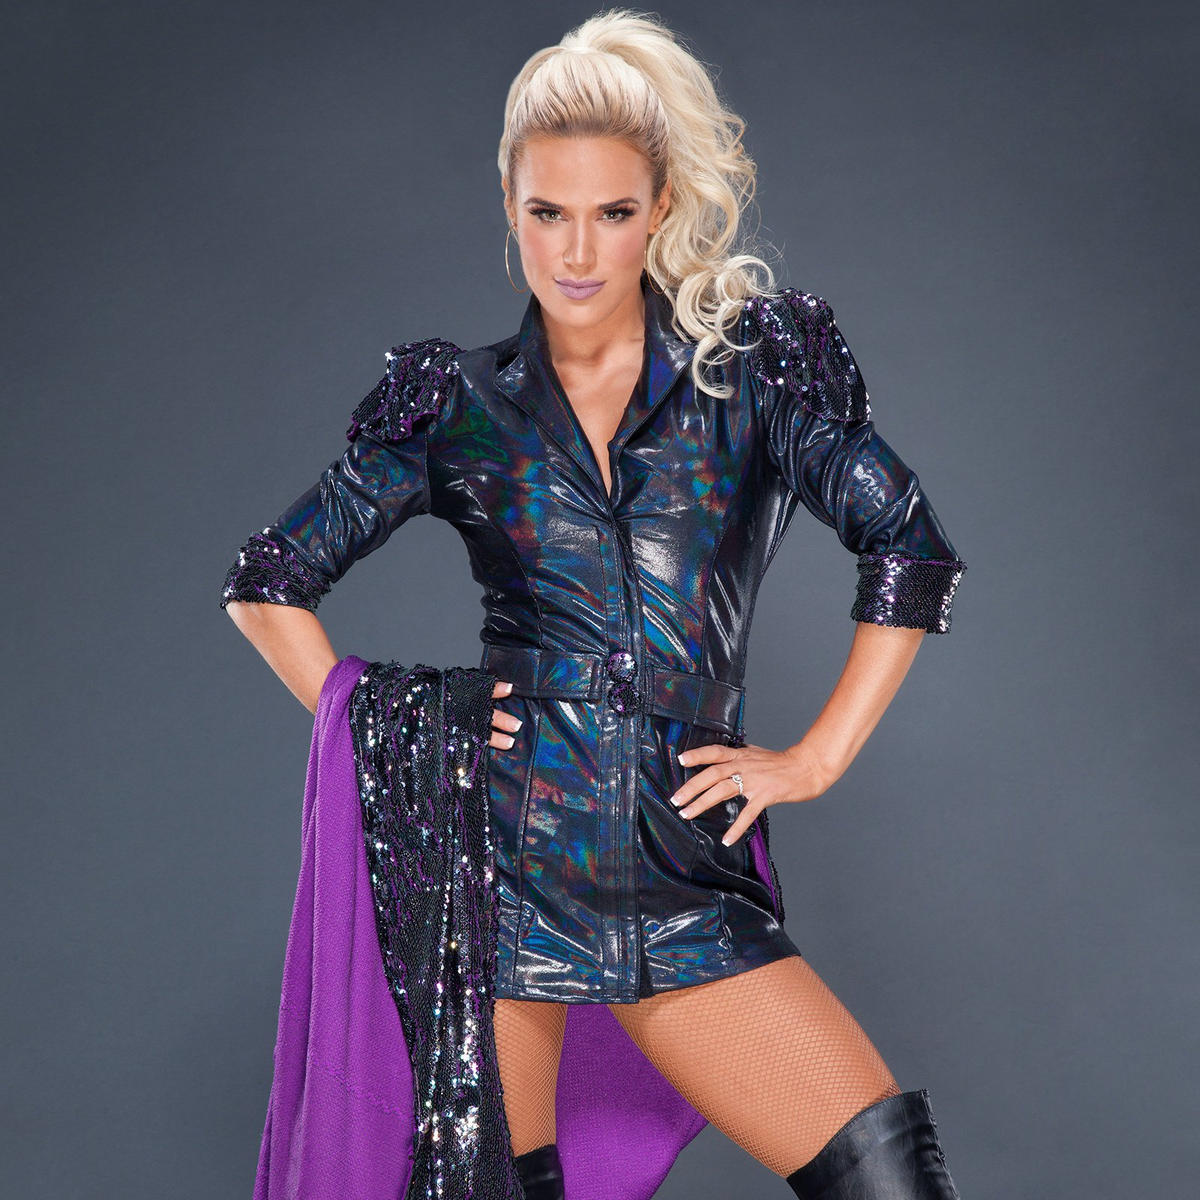 Lana S Ring Gear For Wrestlemania 32 Wwe Com Photo Shoot